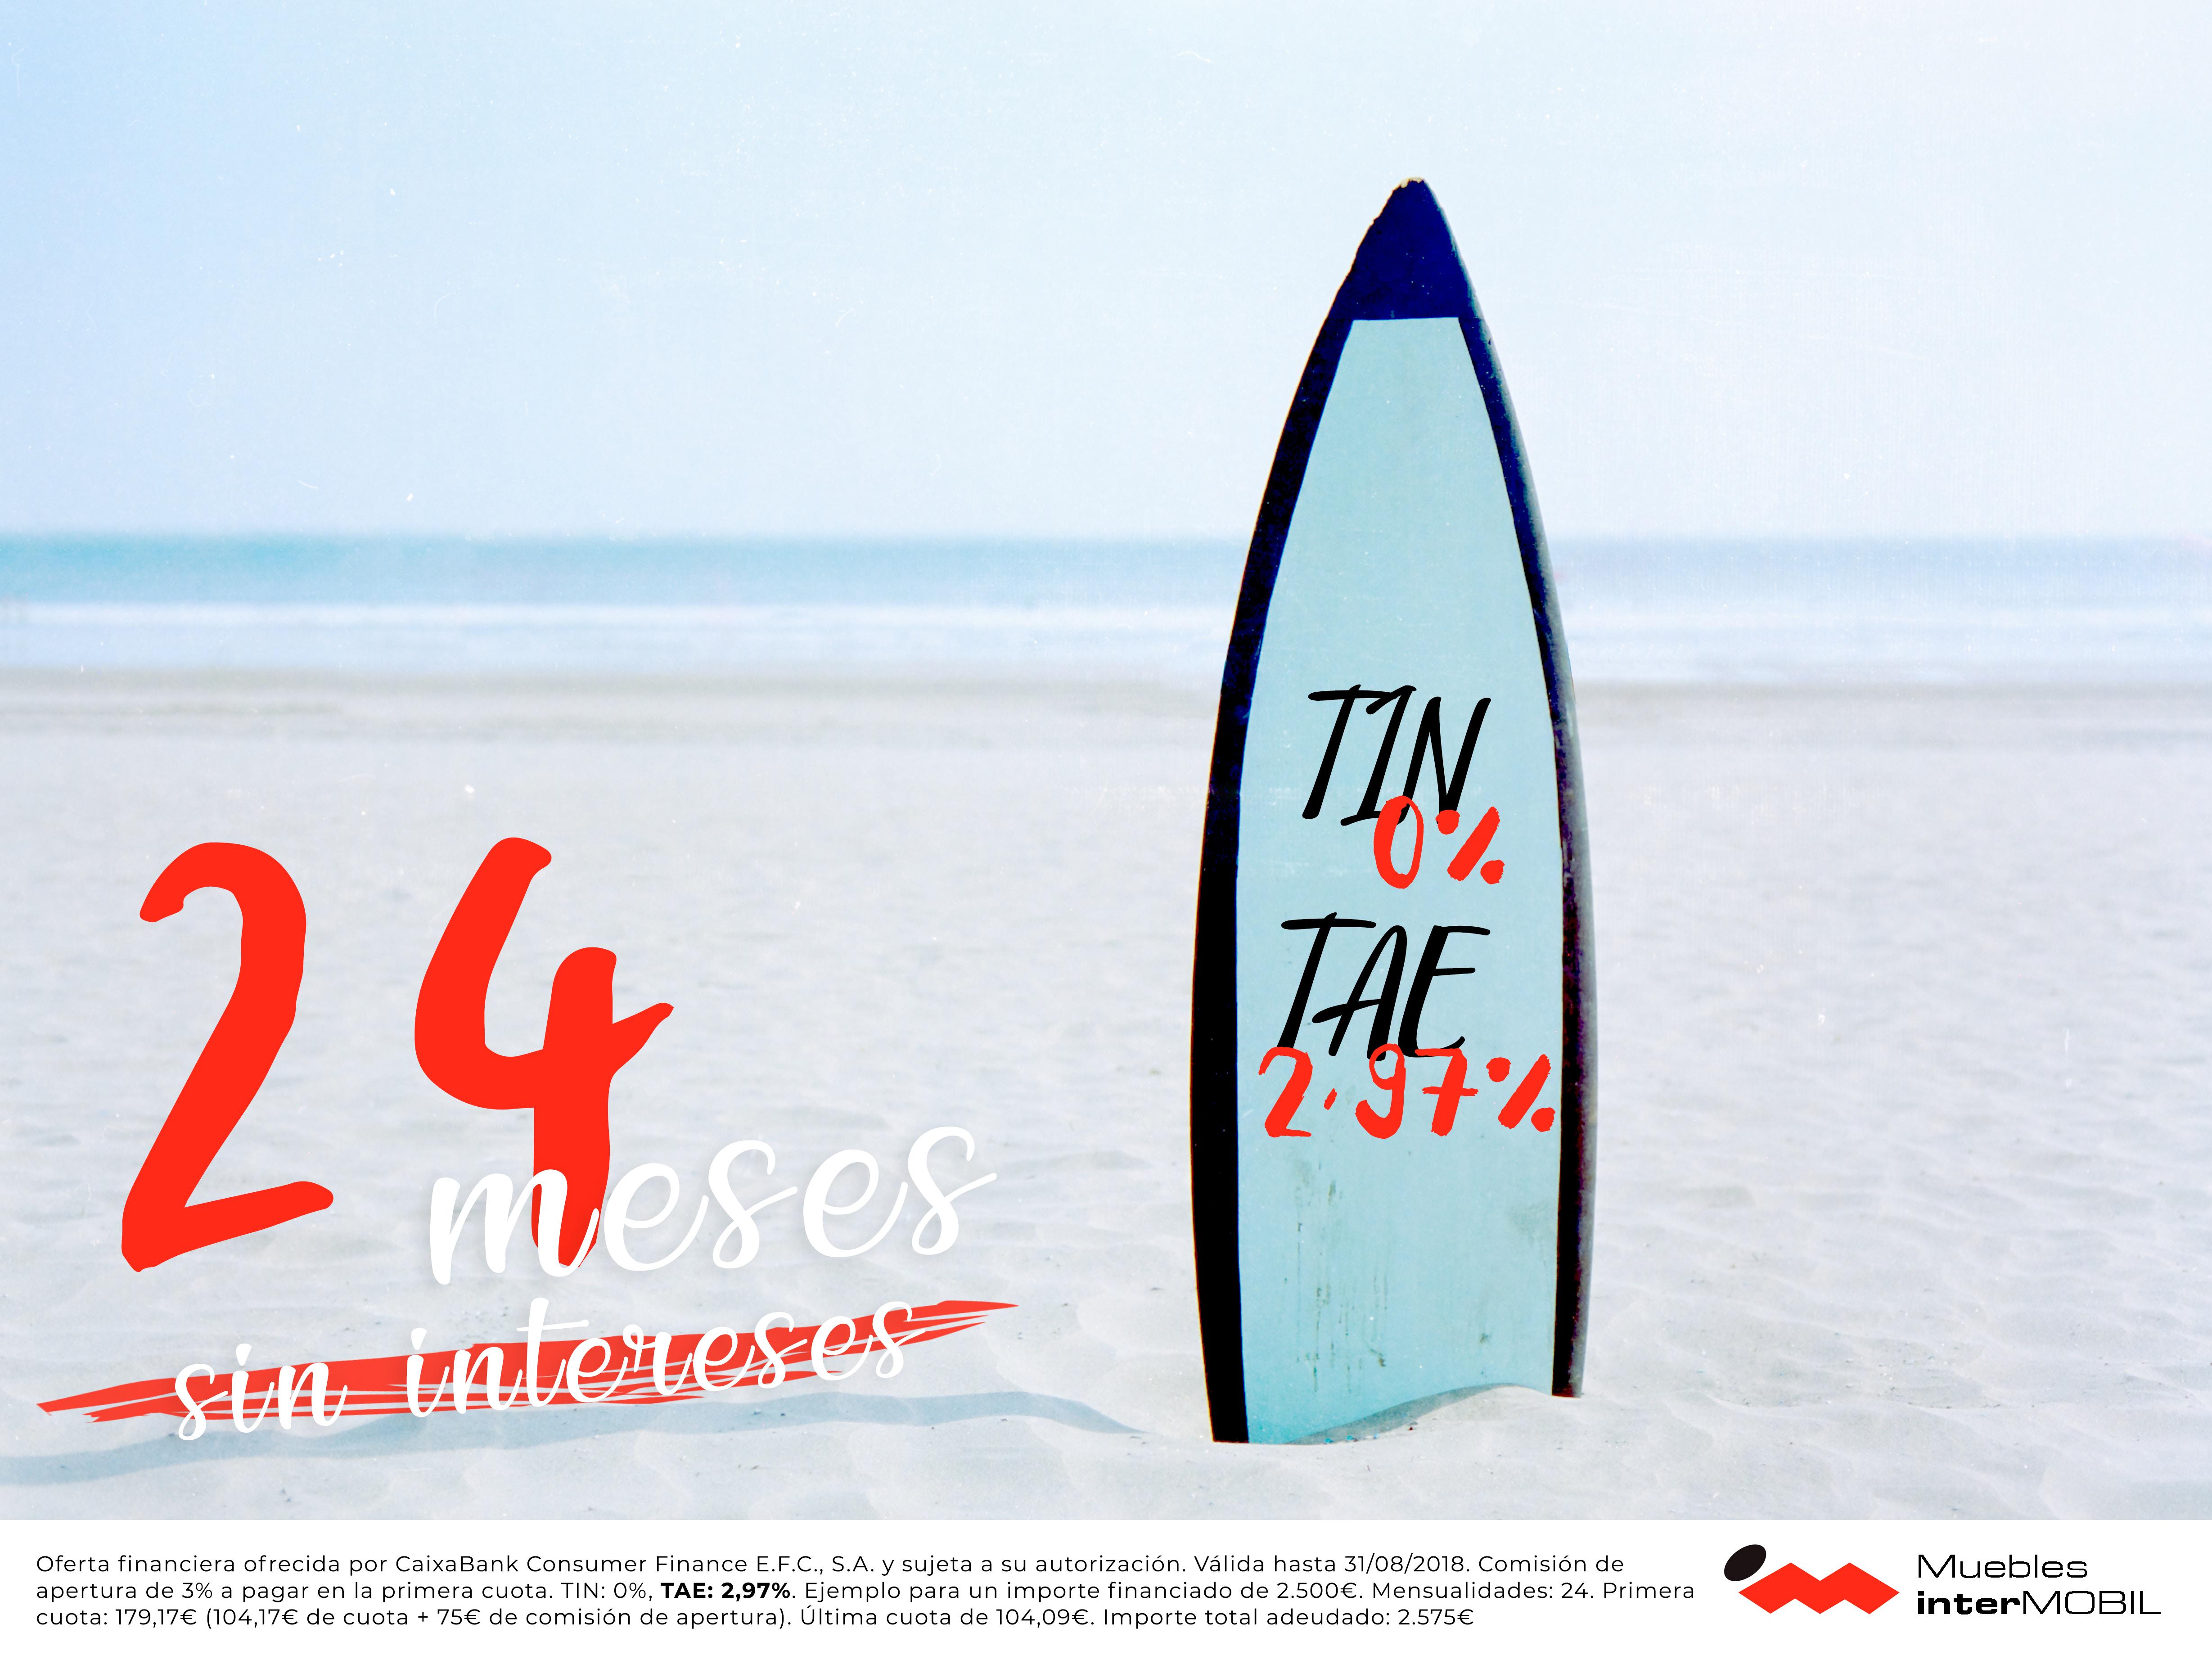 Intermobil surf 2